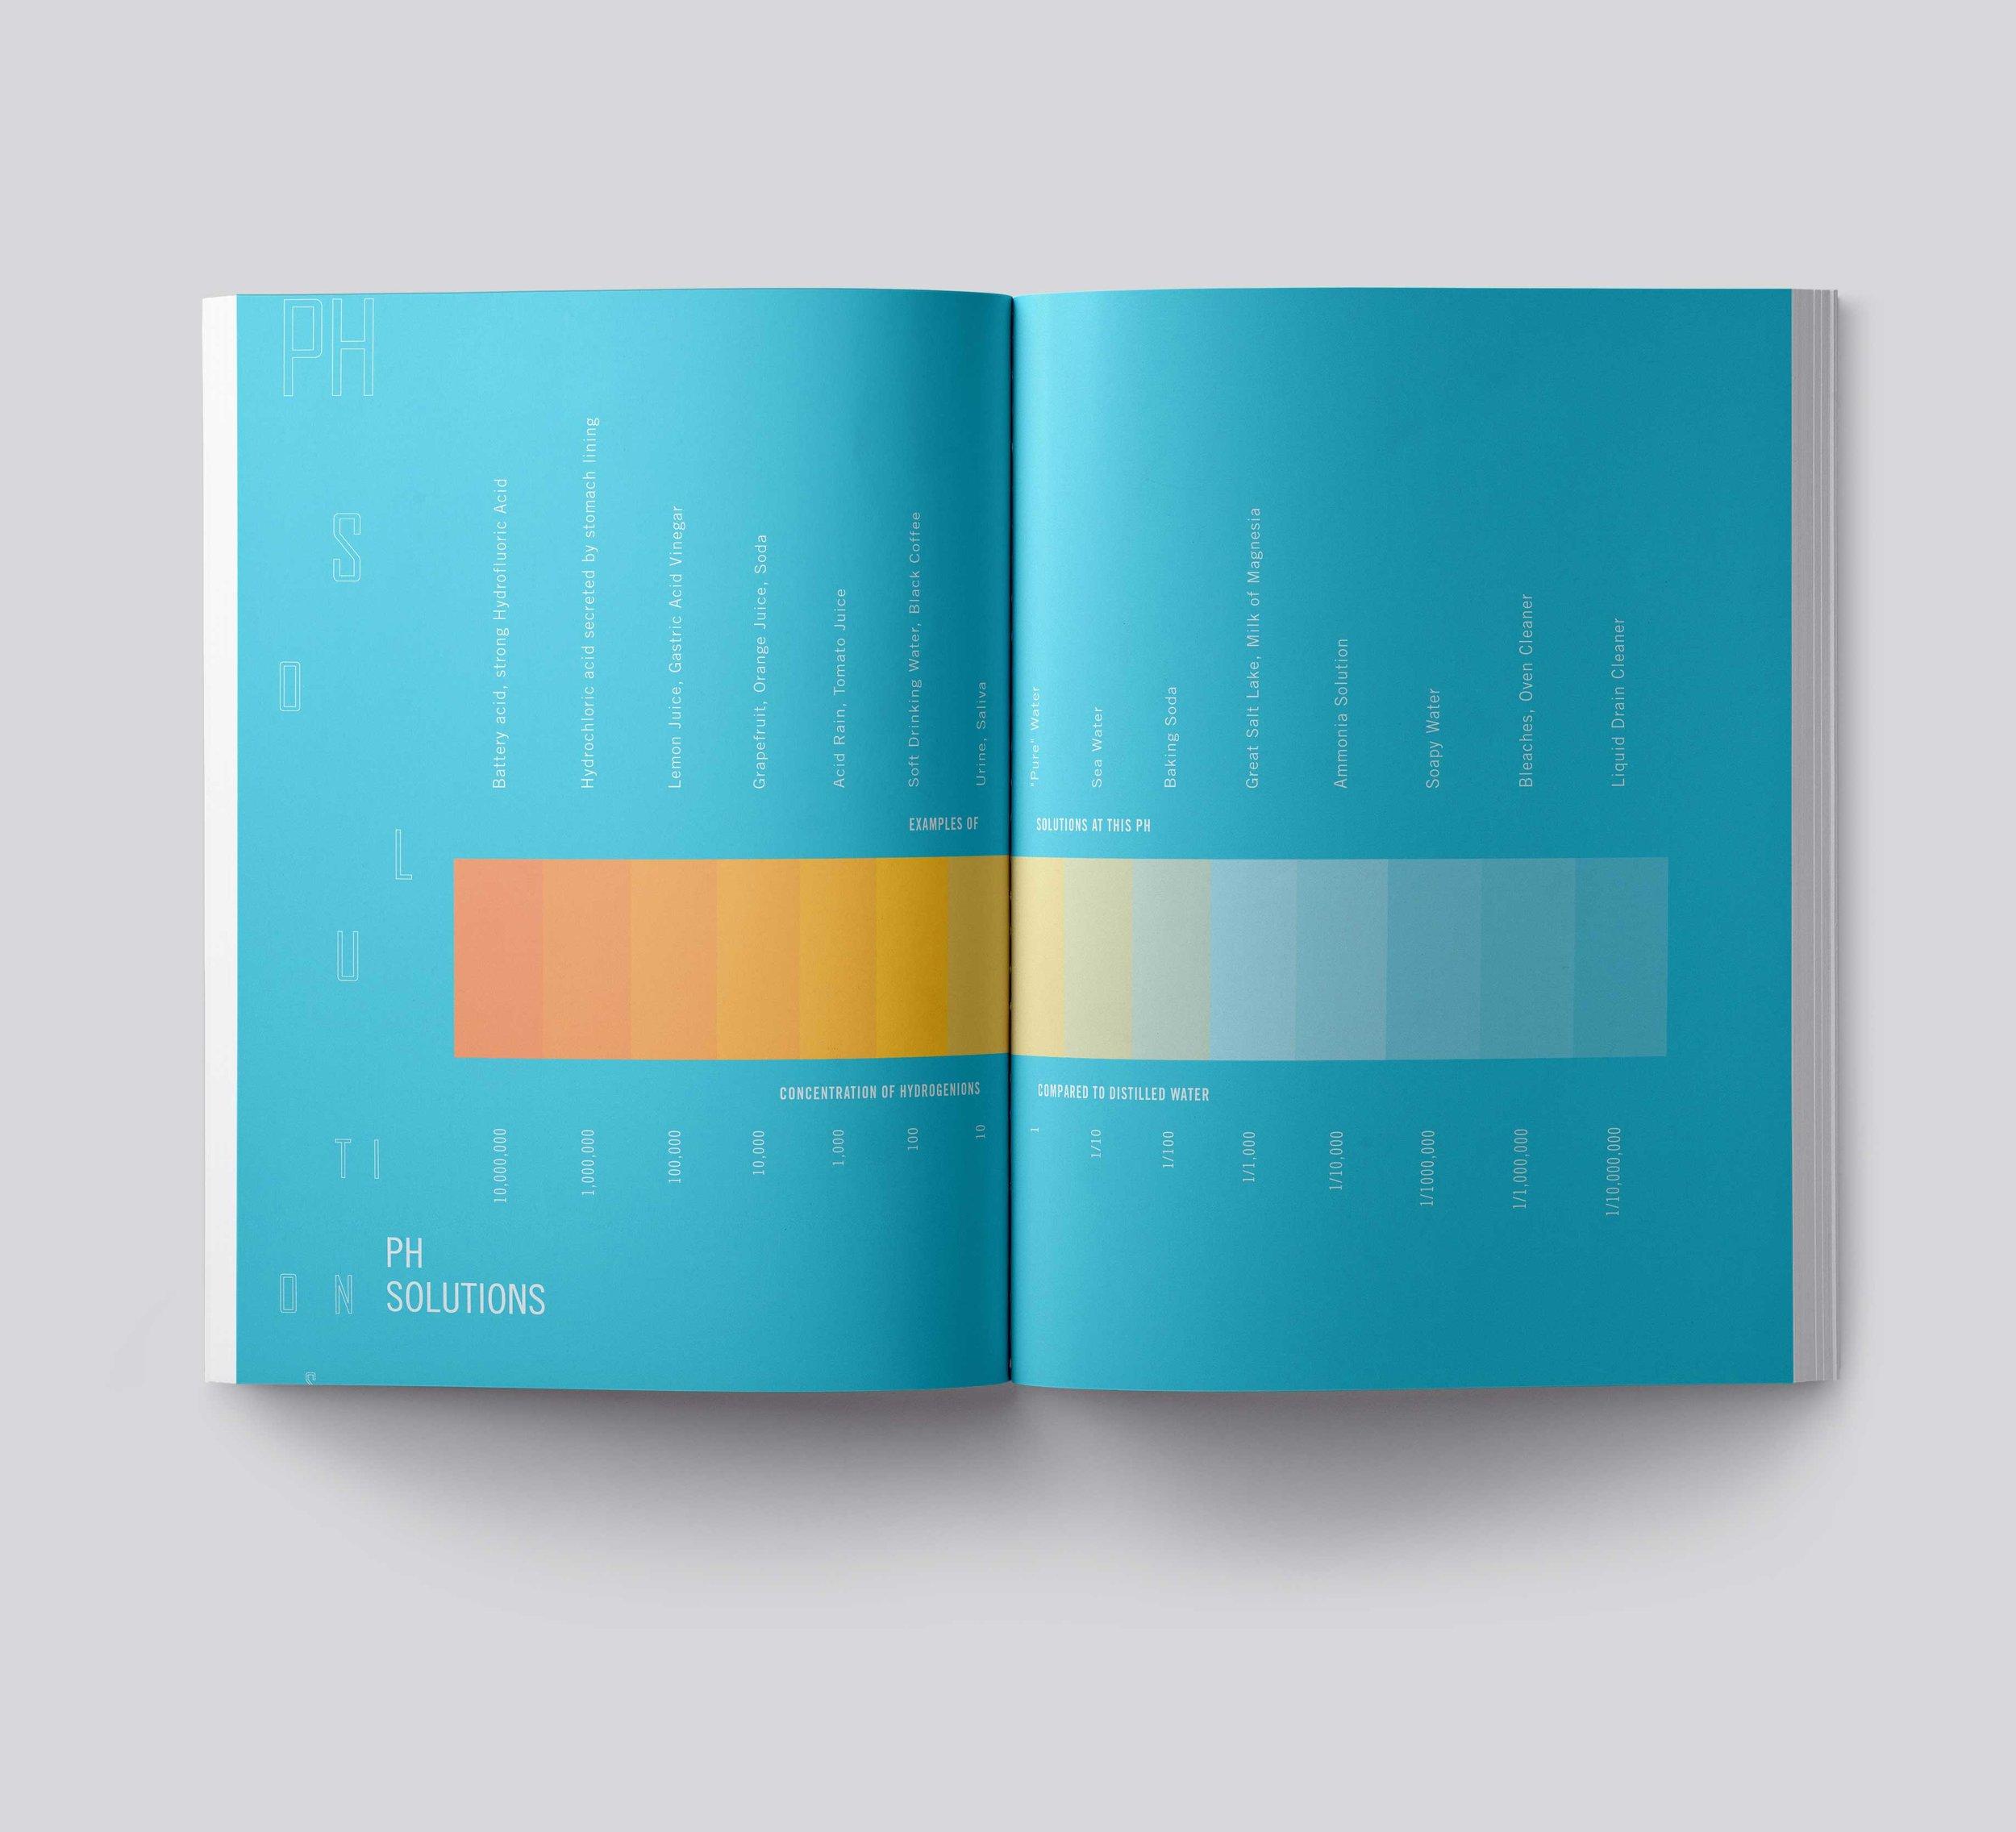 Magazine-USLetter-A4-Mockup-Template_2_3_LOW.jpg